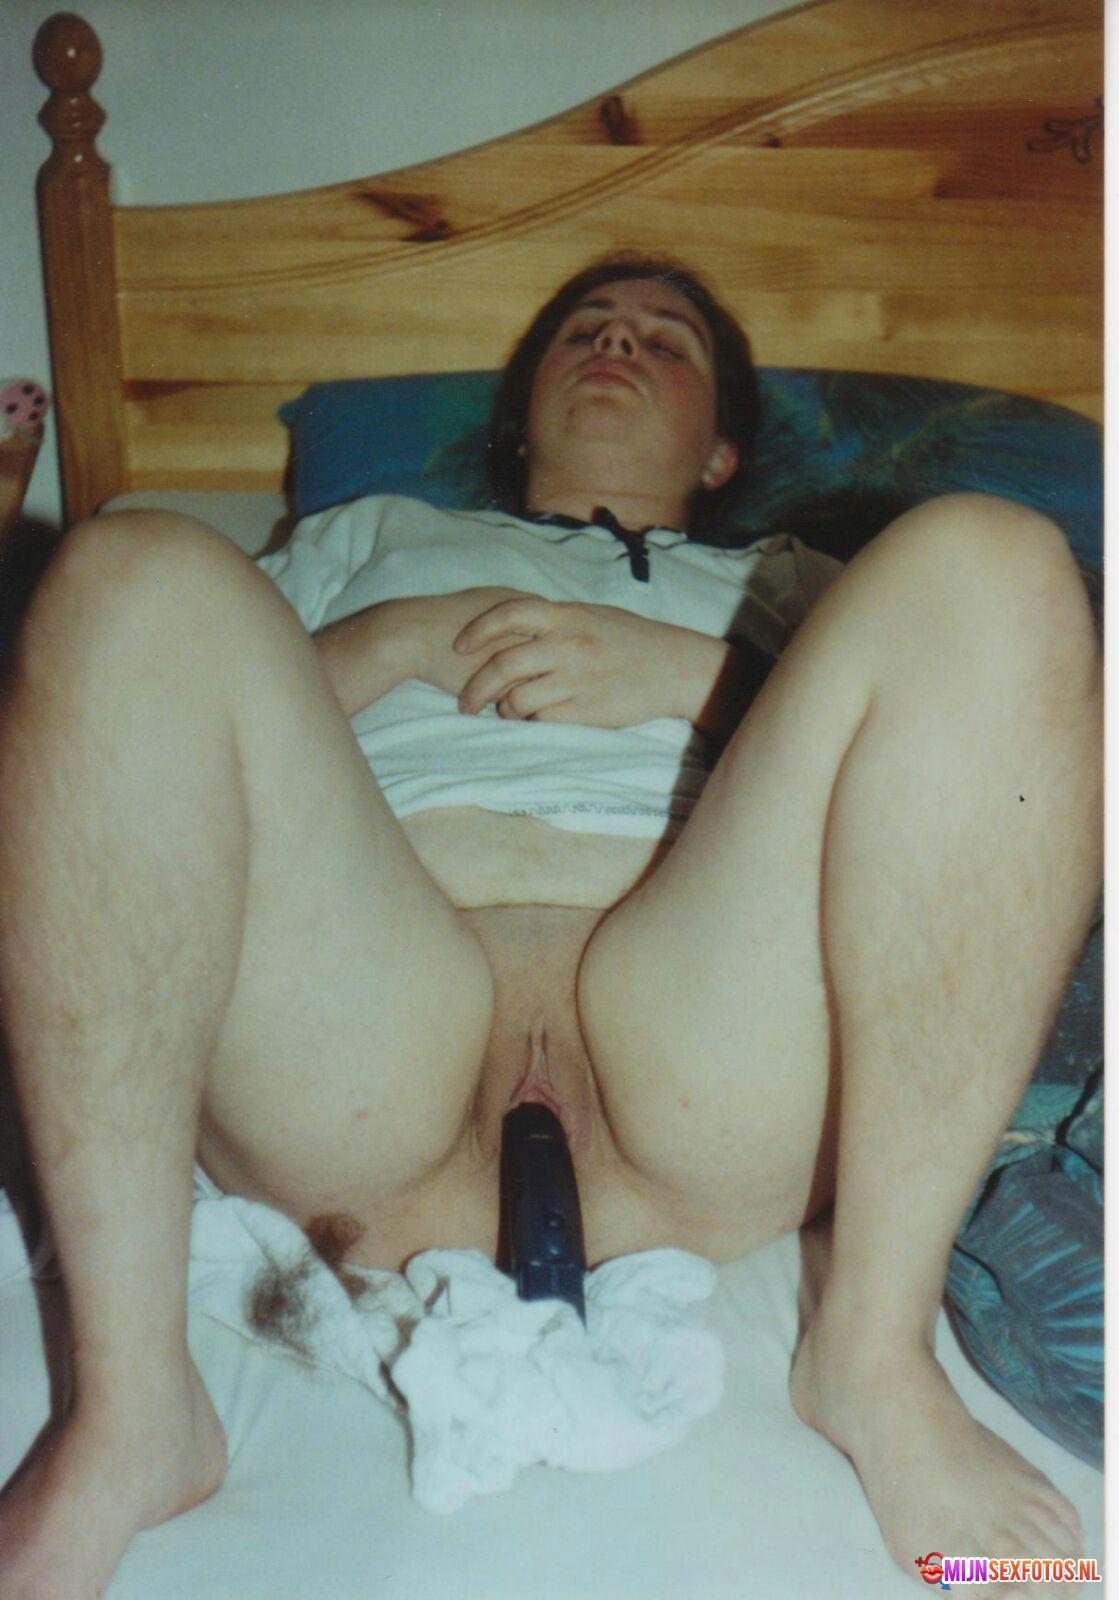 gratis seks afspraak sex in nl